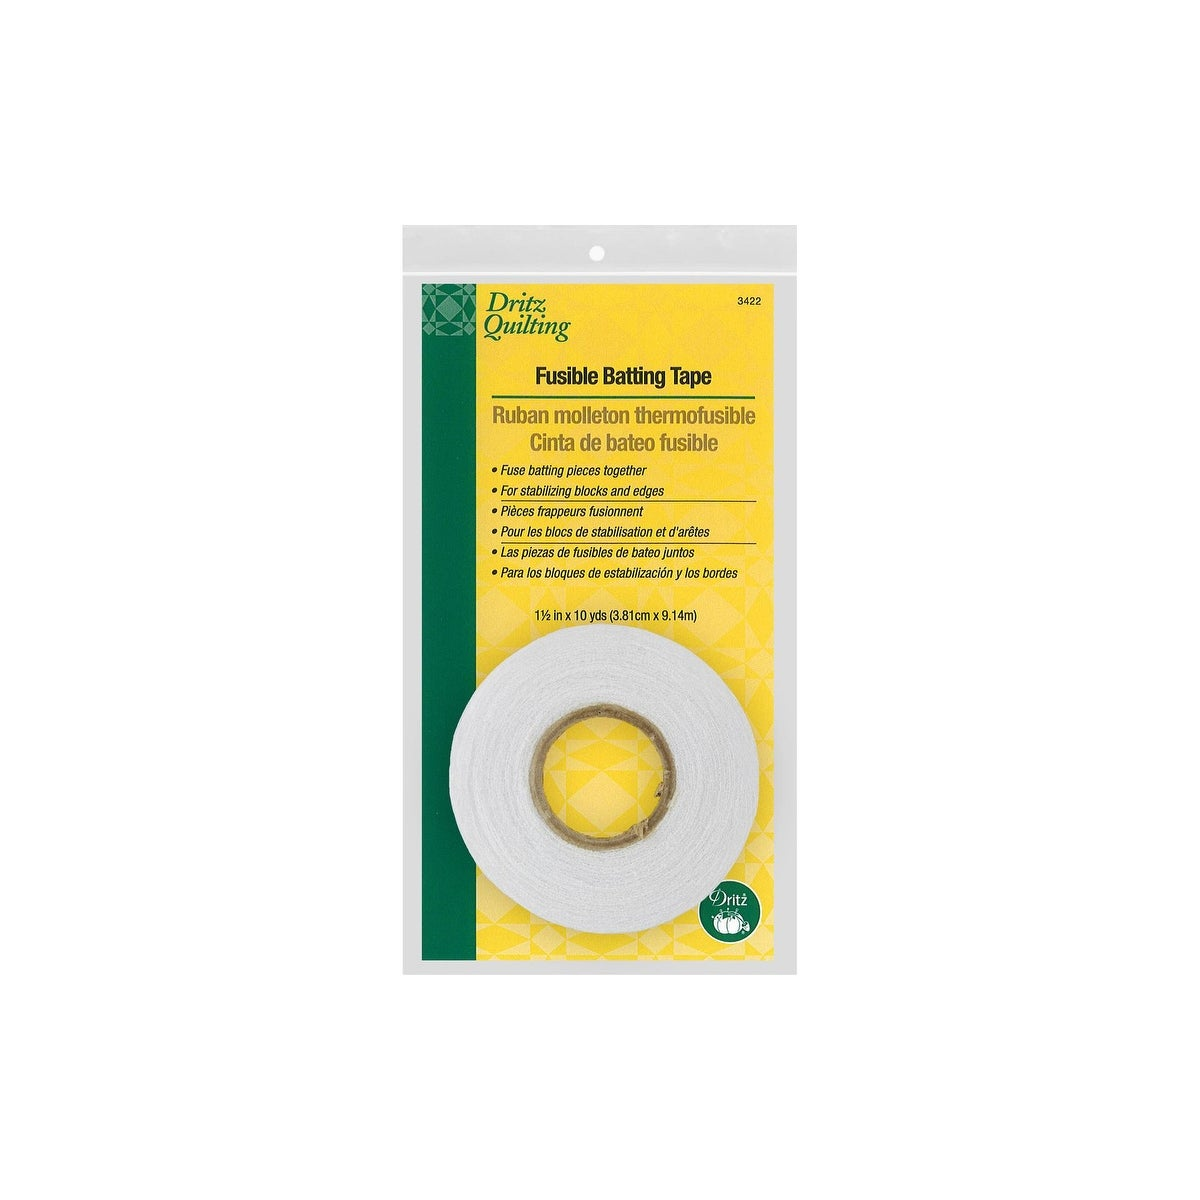 Pellon Easy-Knit Batting /& Seam Tape 1-1//2X10 Yards-White